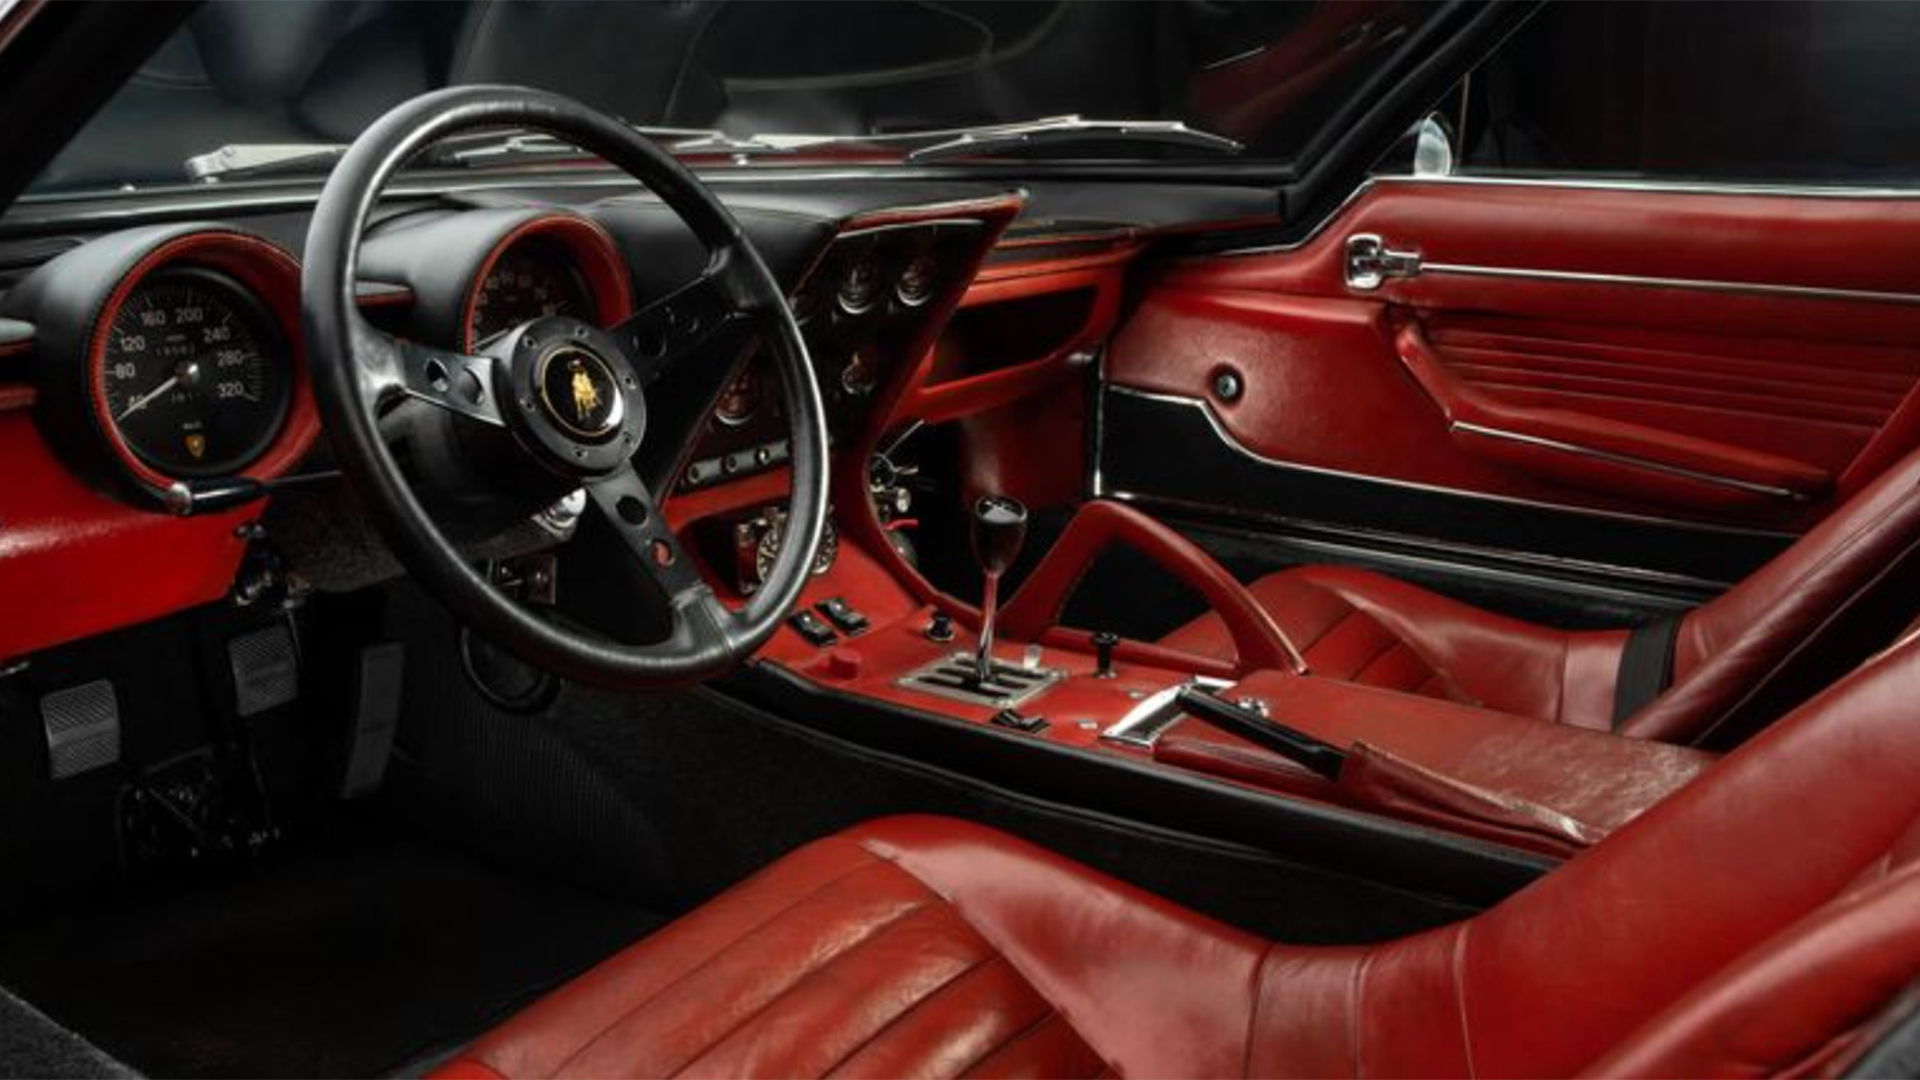 Lamborghini Miura SVJ interior